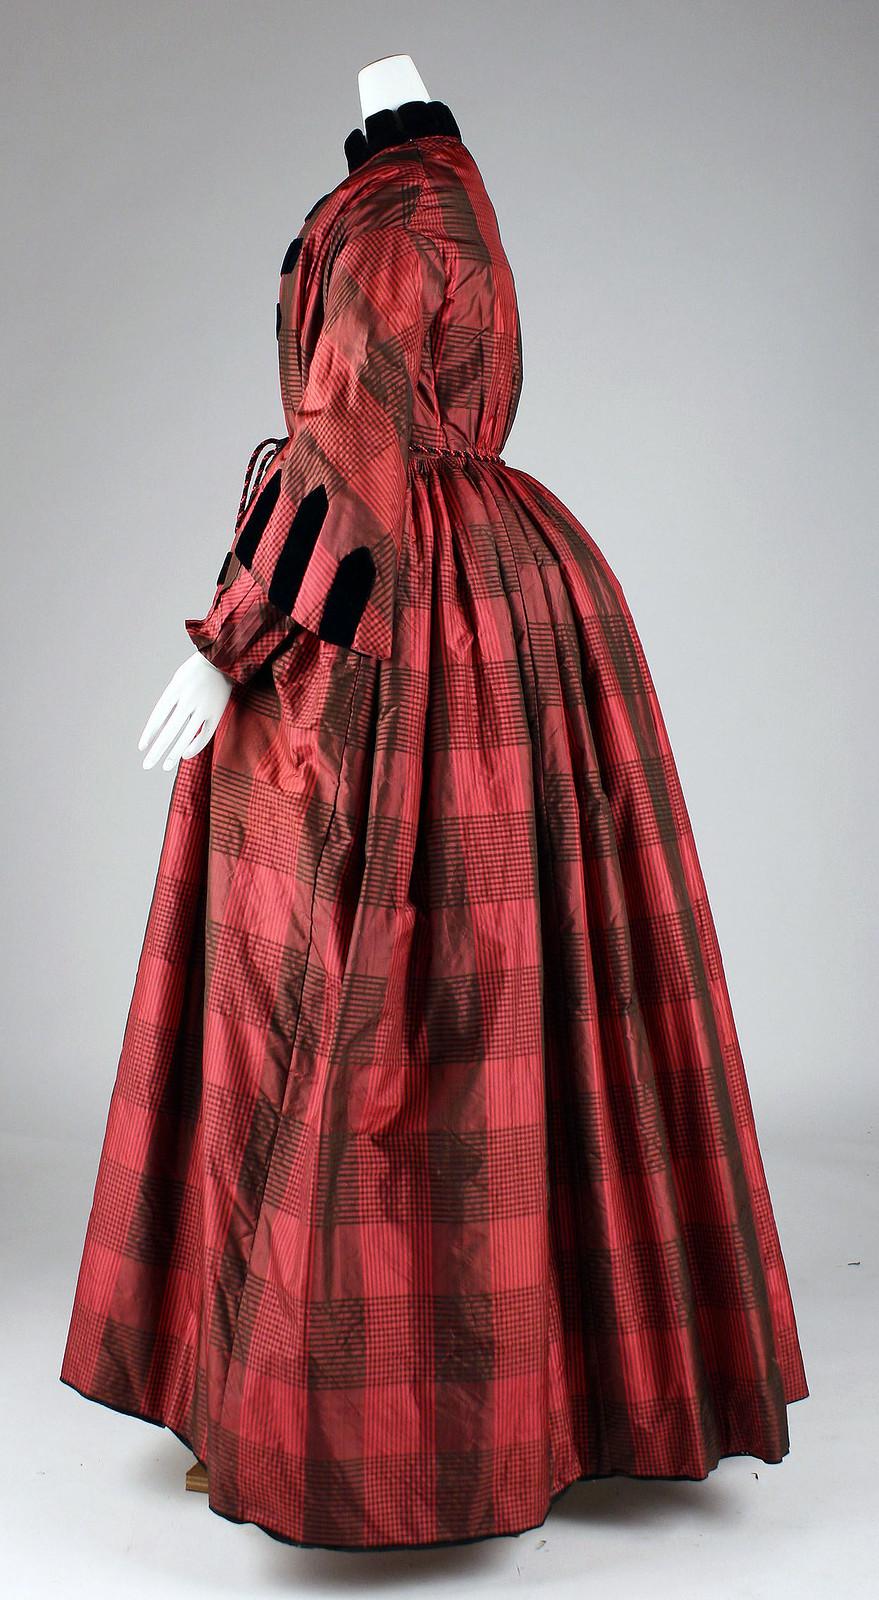 Dressing gown, c.1855, American, metmuseum